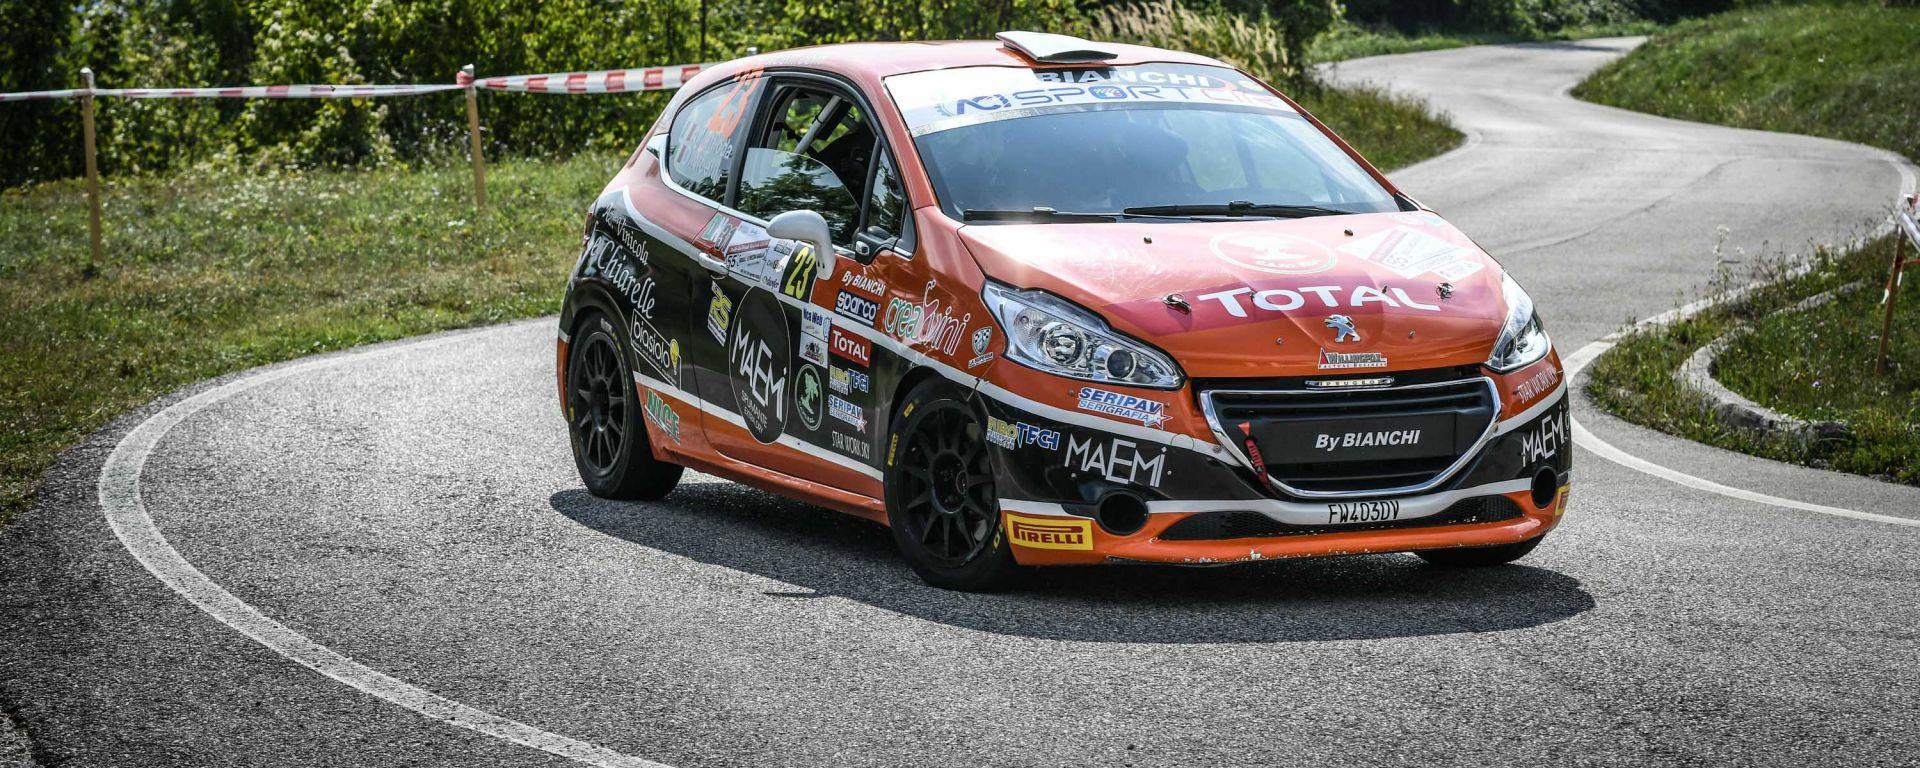 Davide Nicelli - Peugeot 208 R2B